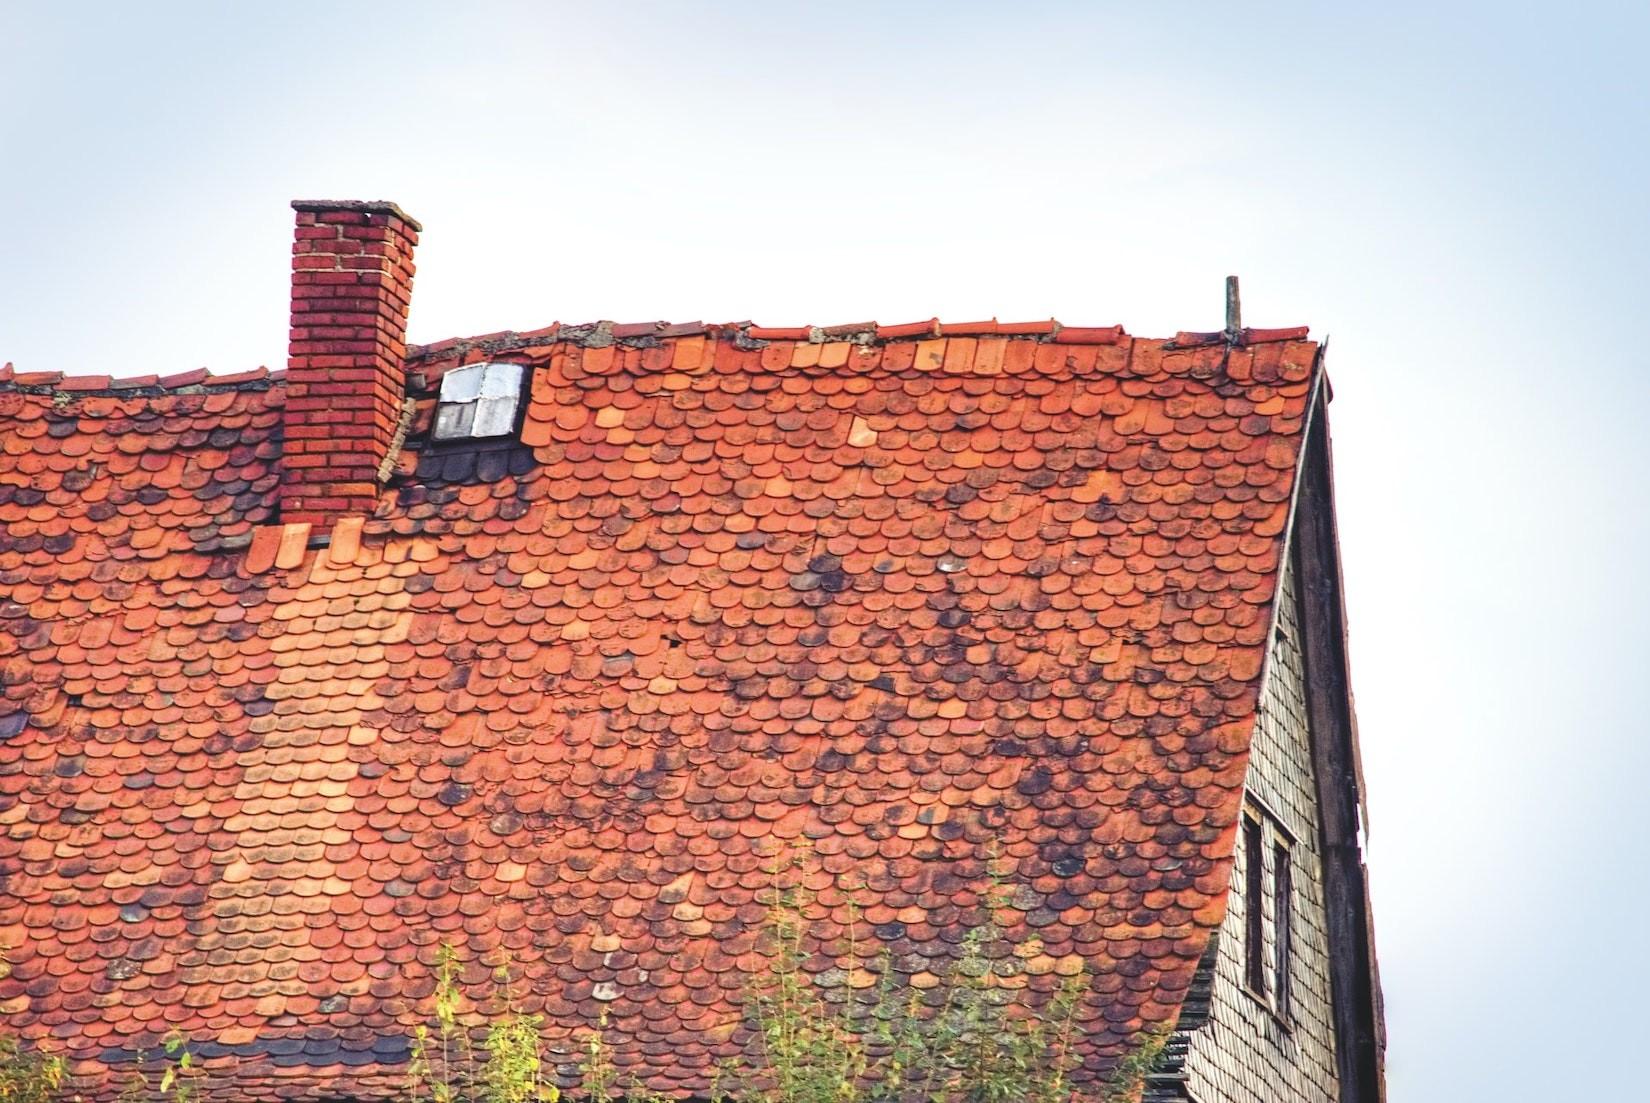 Sturmschaden: Versicherungsschutz auch bei altem Dach?